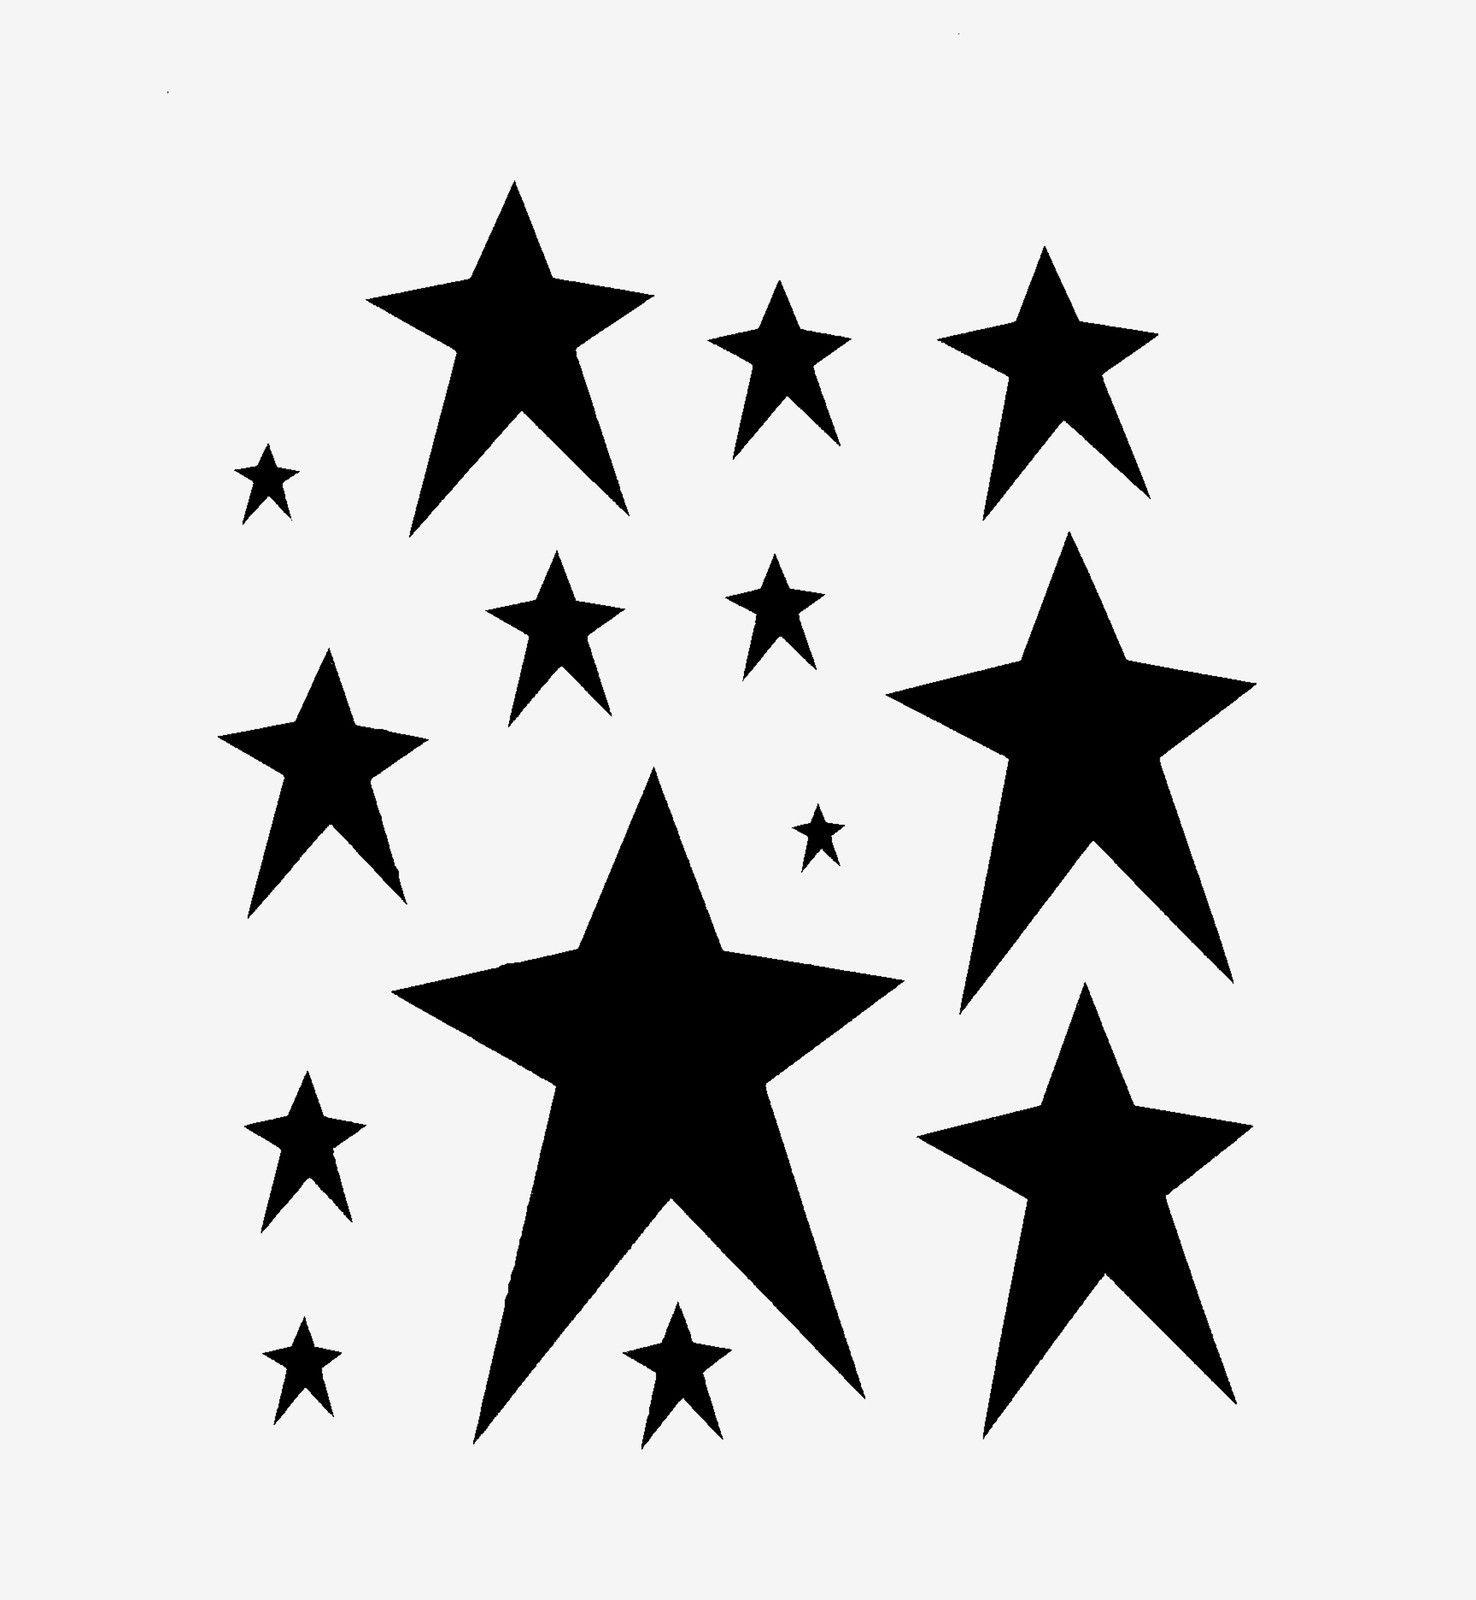 White rustic stars clipart jpg transparent stock PRIMITIVE STAR STENCIL MANY STARS STENCILS CELESTIAL CRAFT ... jpg transparent stock